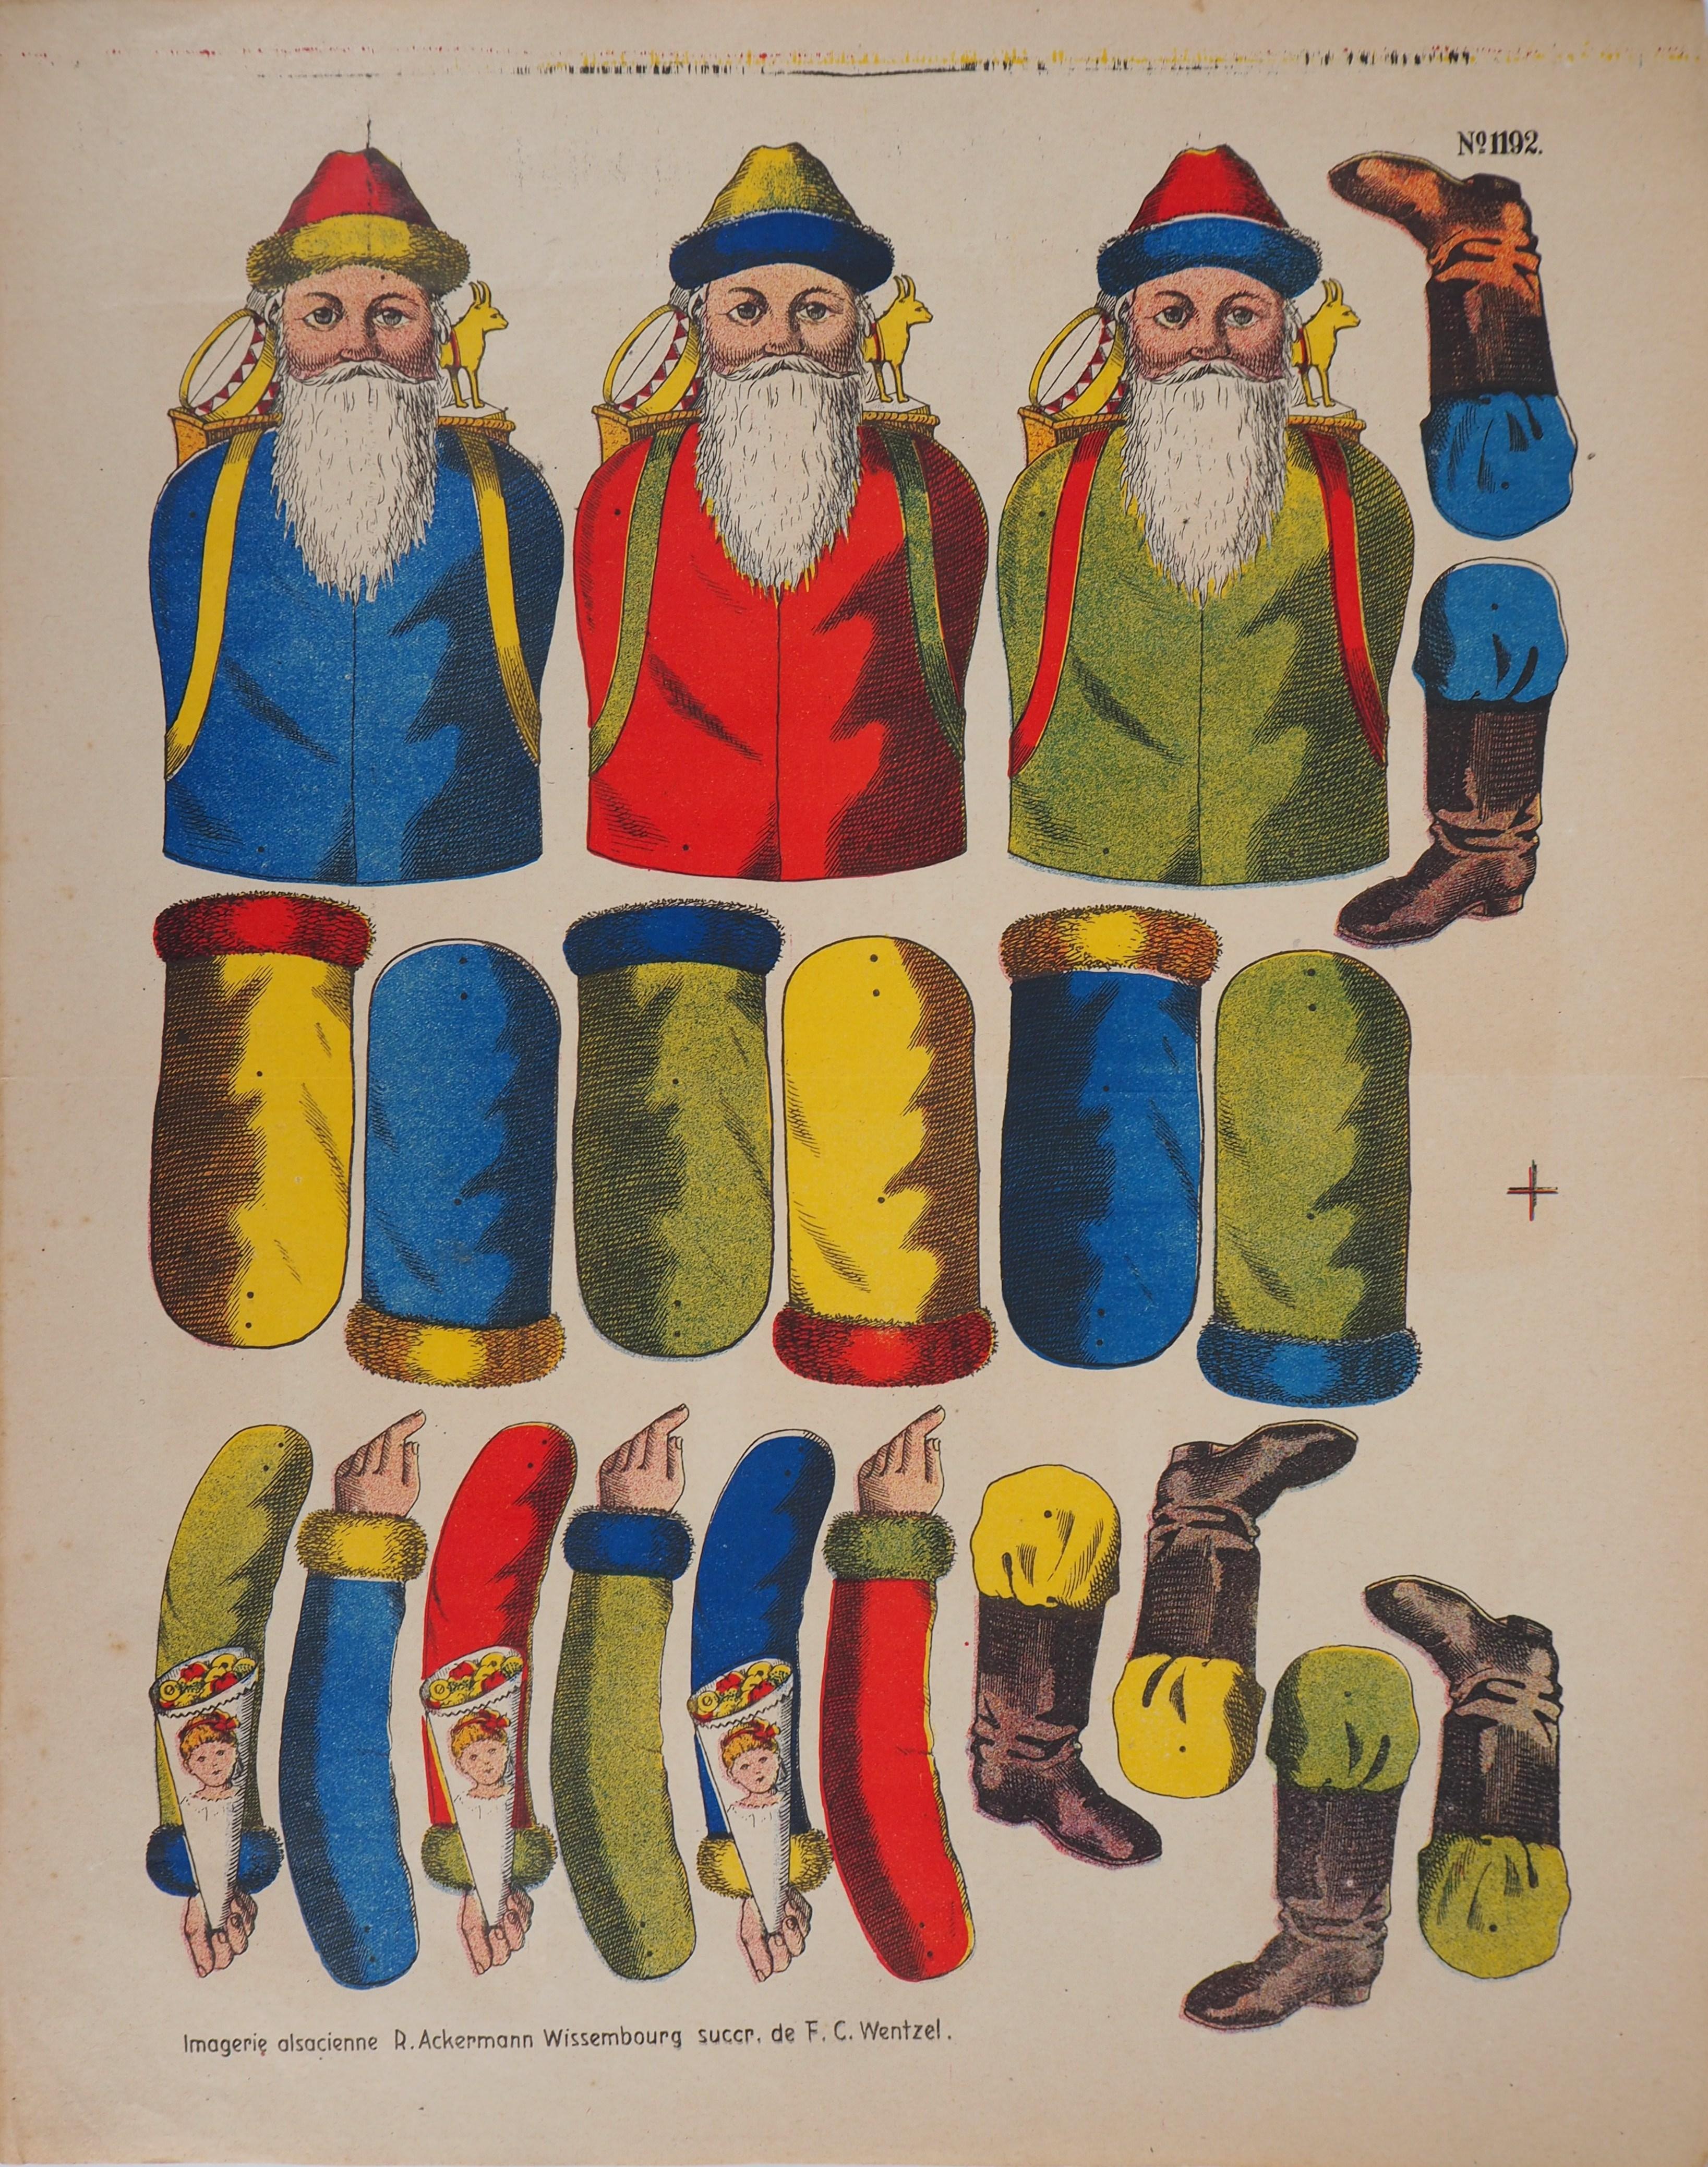 Imagerie de Wissembourg - Christmas Santa Claus - Lithograph and stencil - 1906